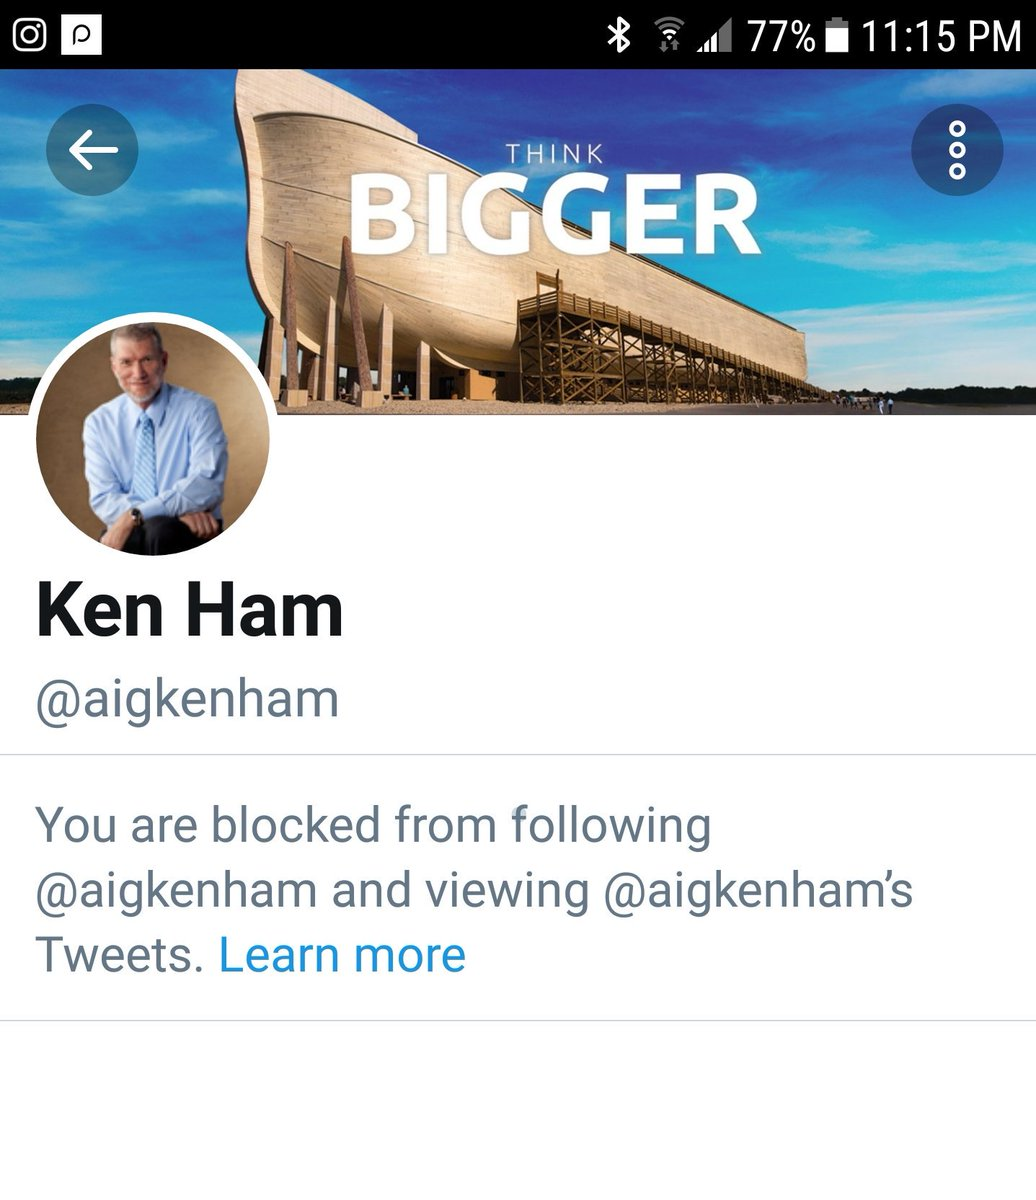 Looks like Ken didn&#39;t like me mocking him. #blocked <br>http://pic.twitter.com/YYwiXnywtb